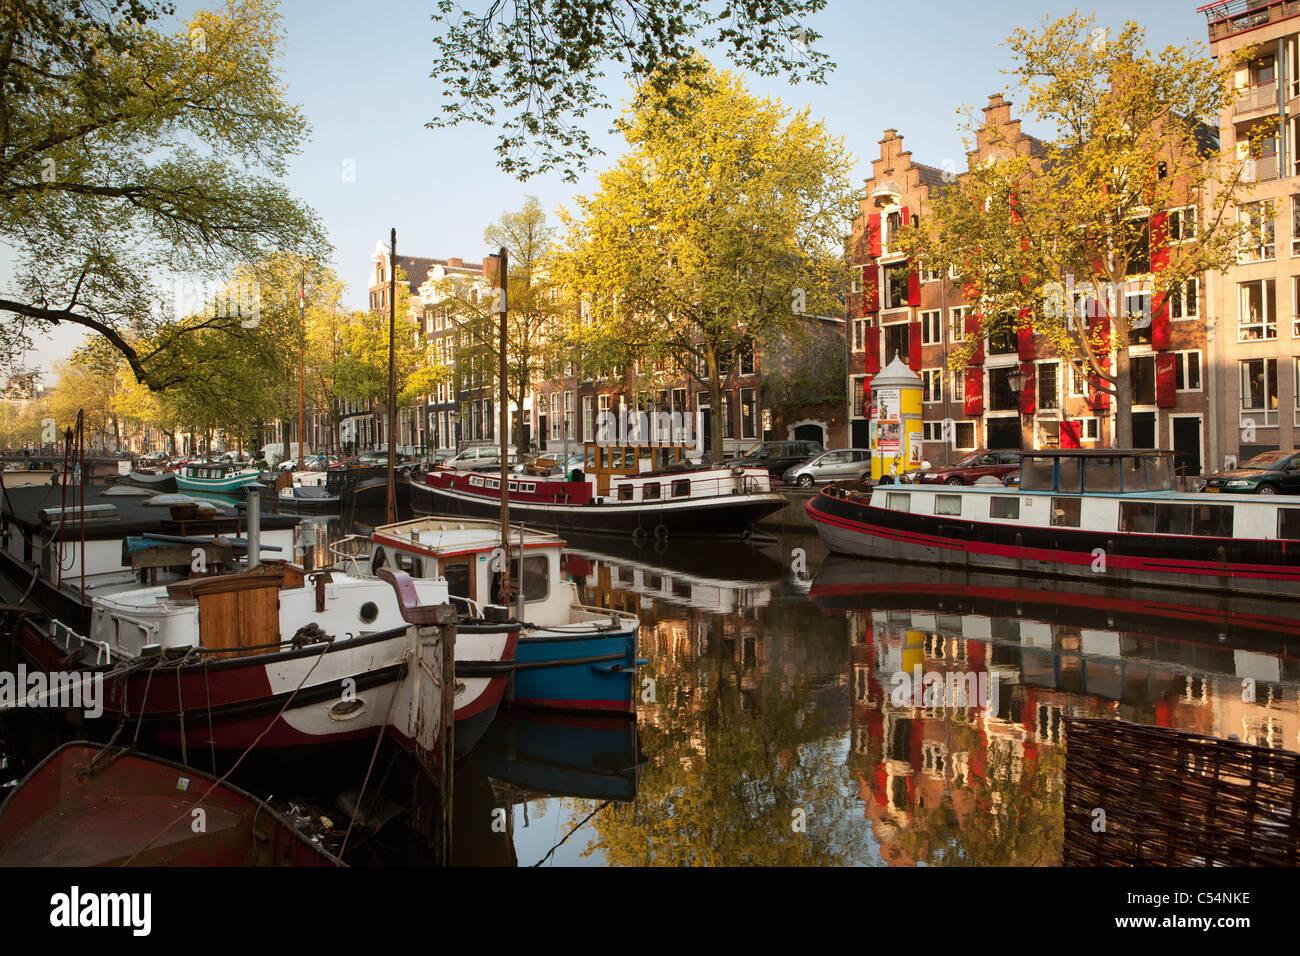 Niederlande, Amsterdam, 17. Jahrhundert beherbergt und Hausboote am Kanal namens Keizersgracht. UNESCO-Weltkulturerbe. Stockbild